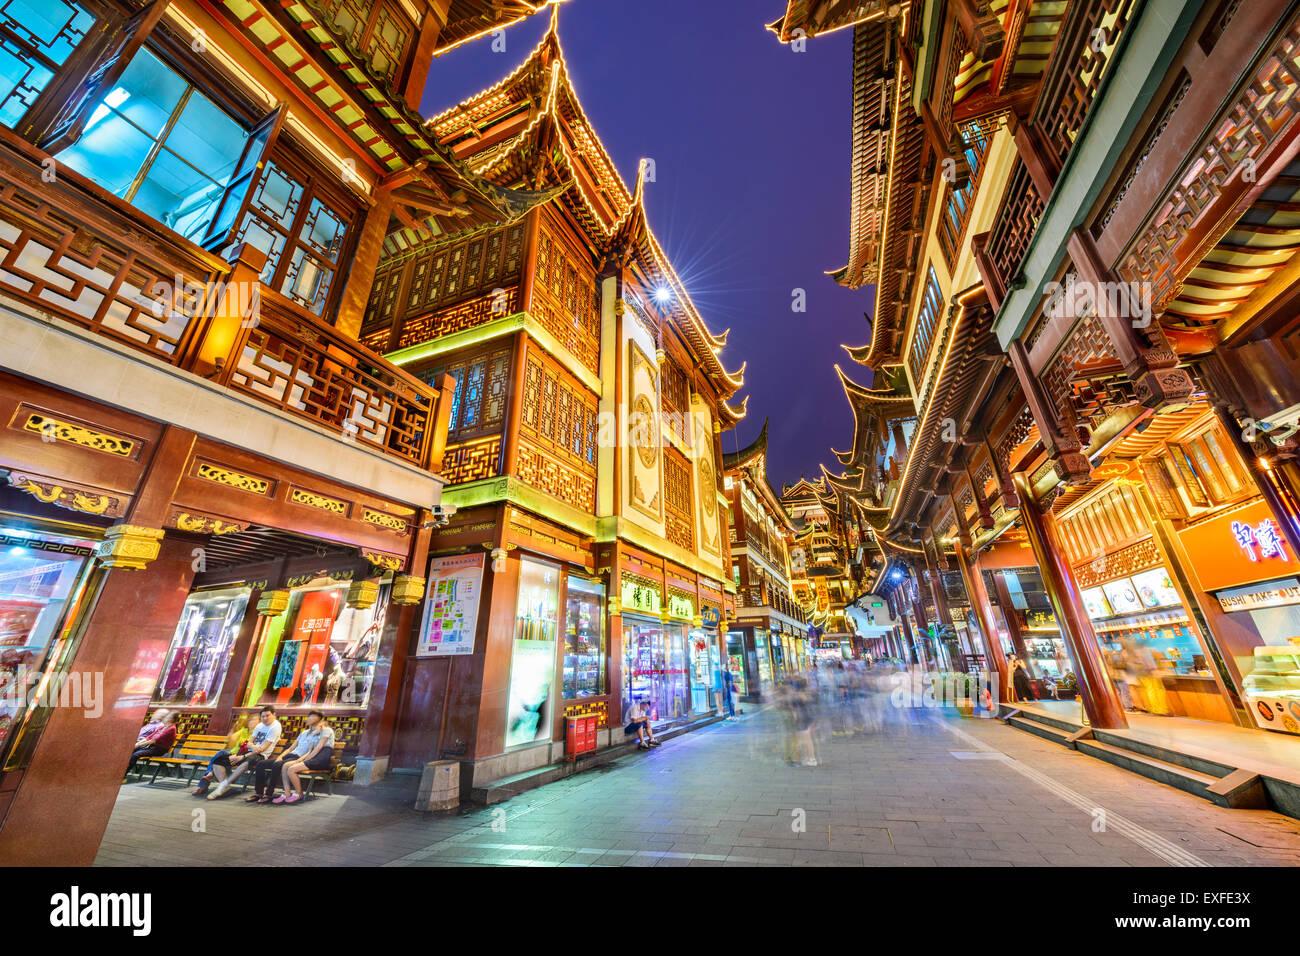 Shopper im Yuyuan Bazar von Shanghai, China. Stockbild